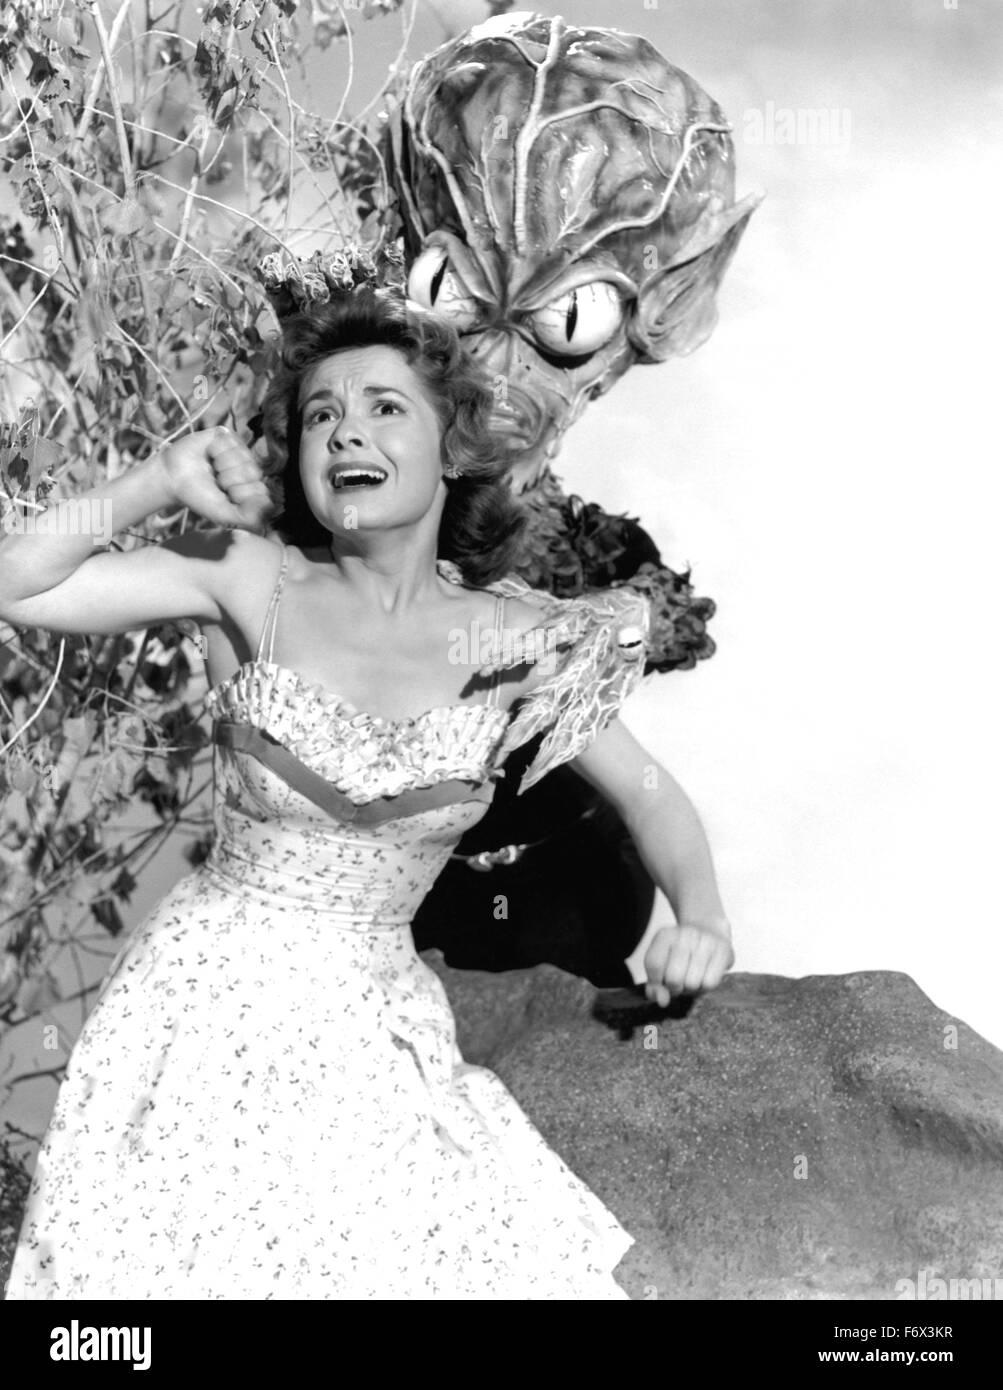 INVASION OF THE SAUCER MEN 1957 Malibu Productions film with Gloria Castillo - Stock Image